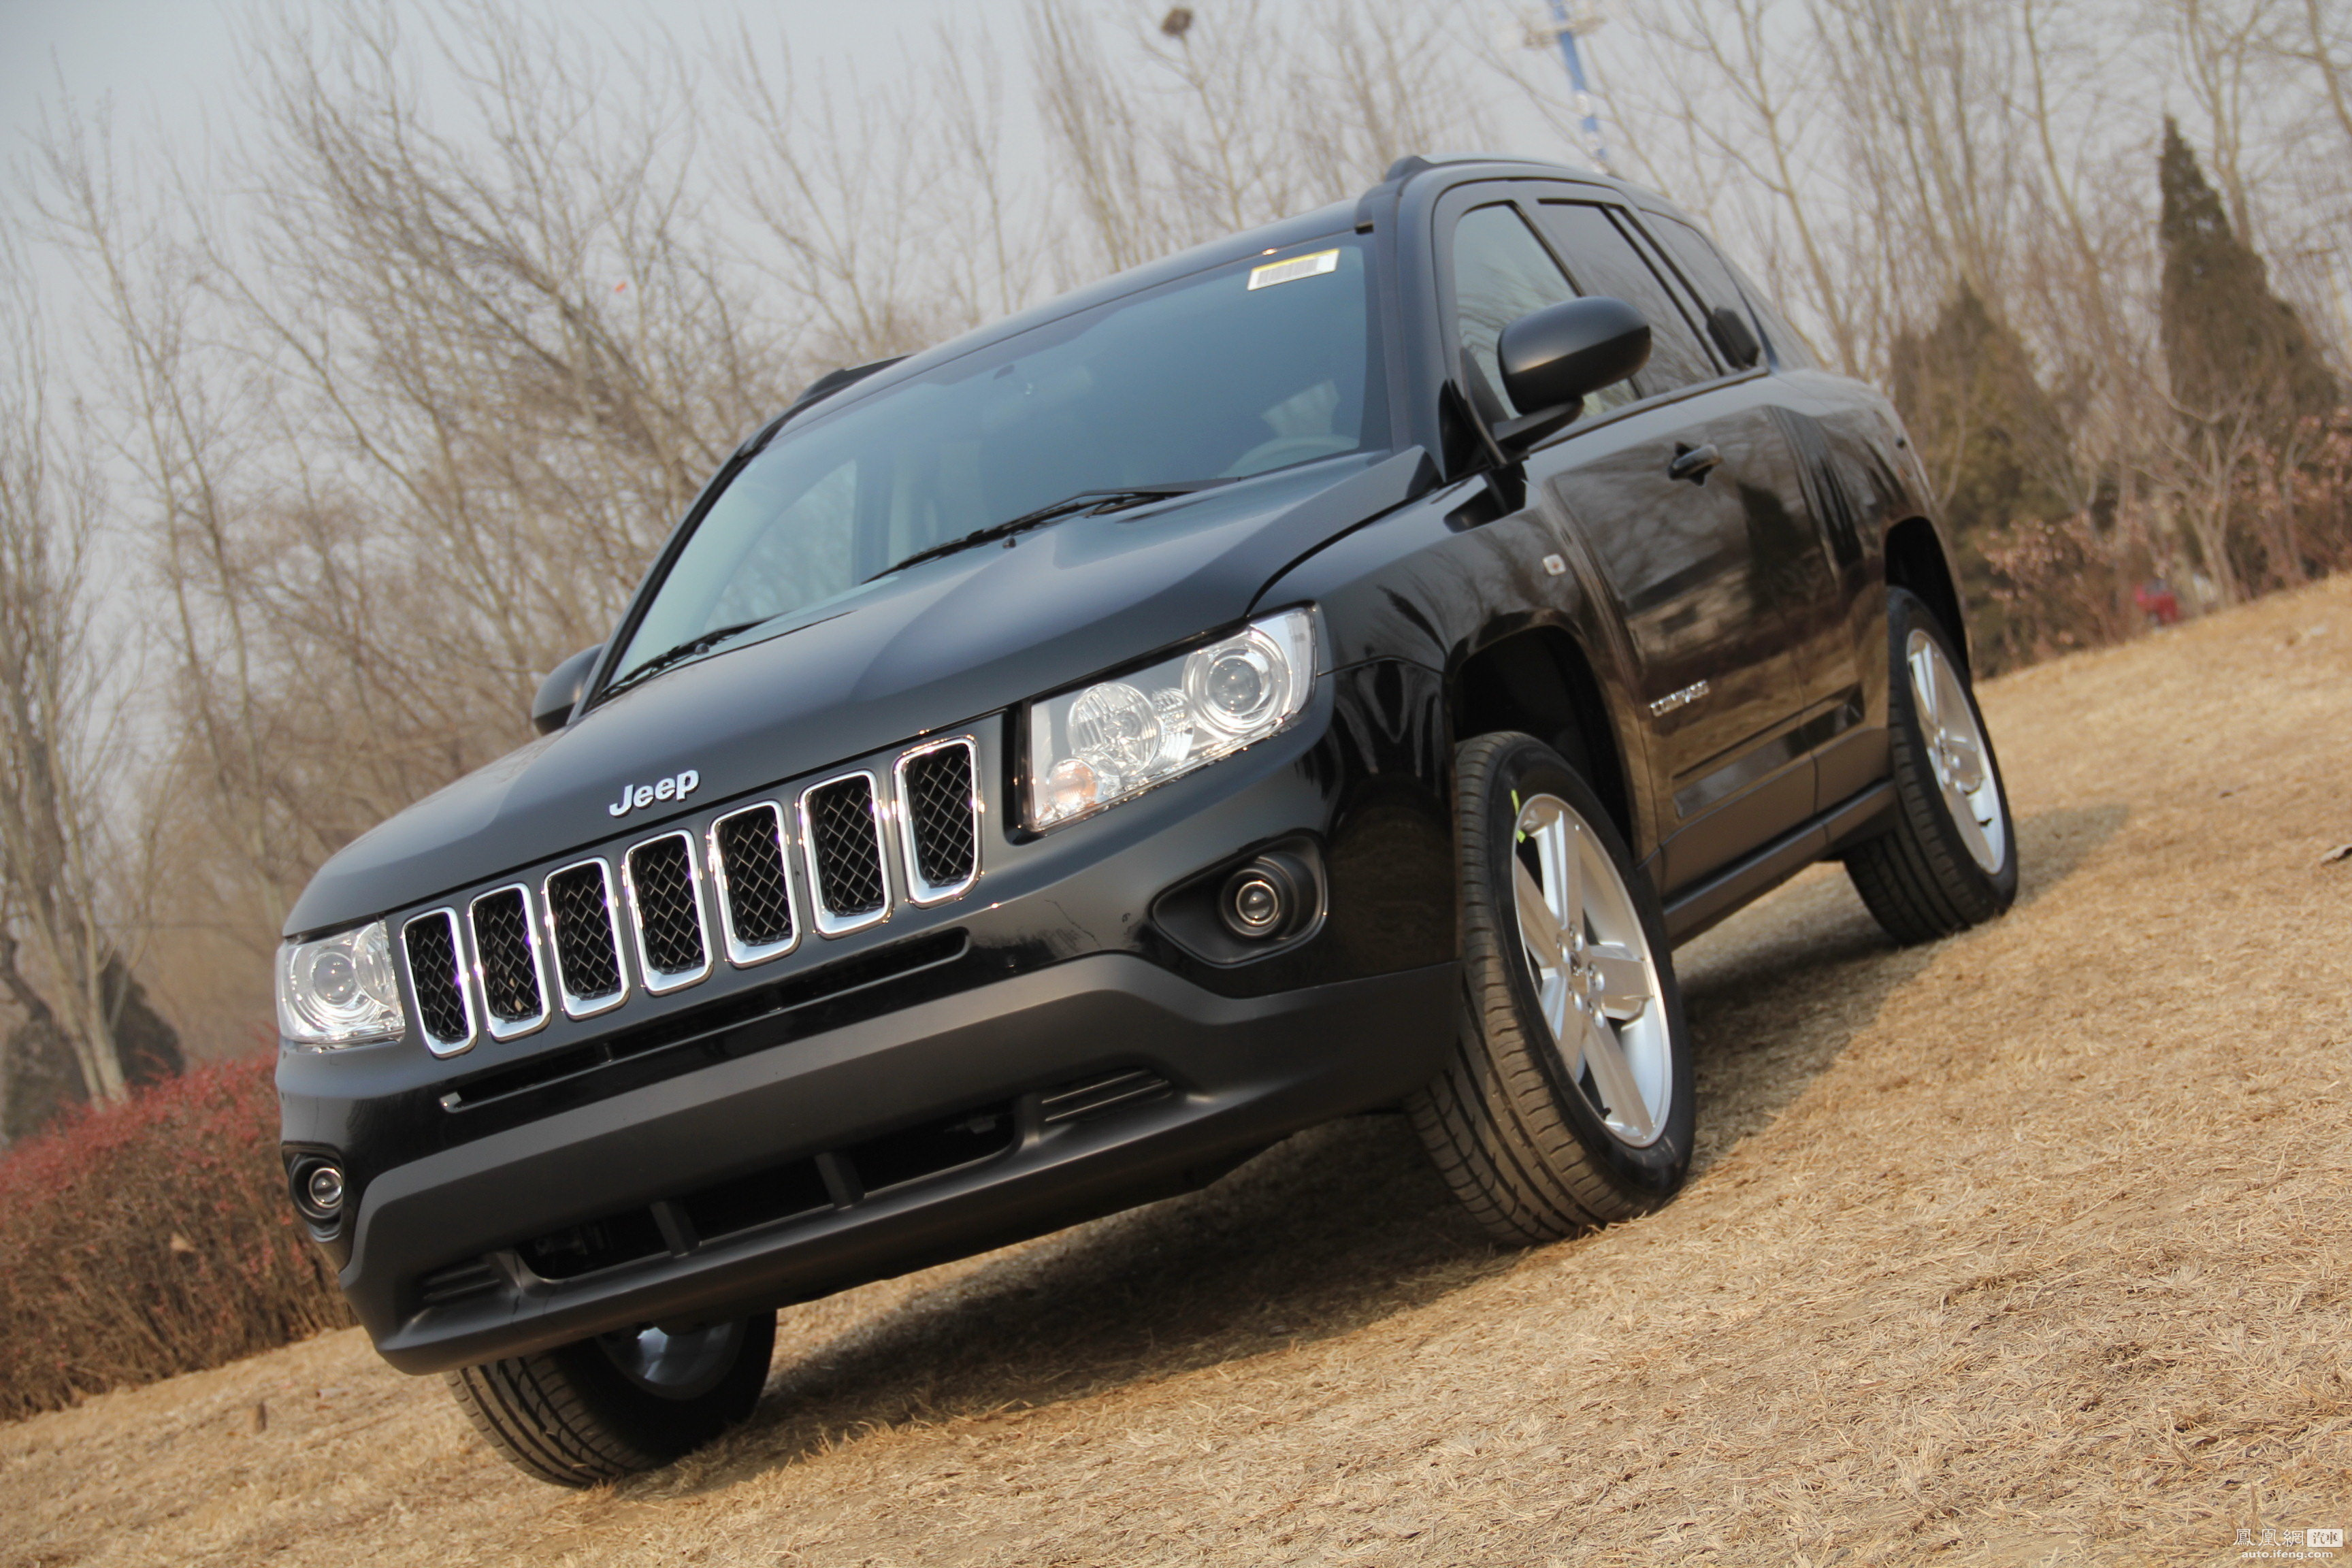 jeep指南者2012款有没有解决三元催化问题啊高清图片